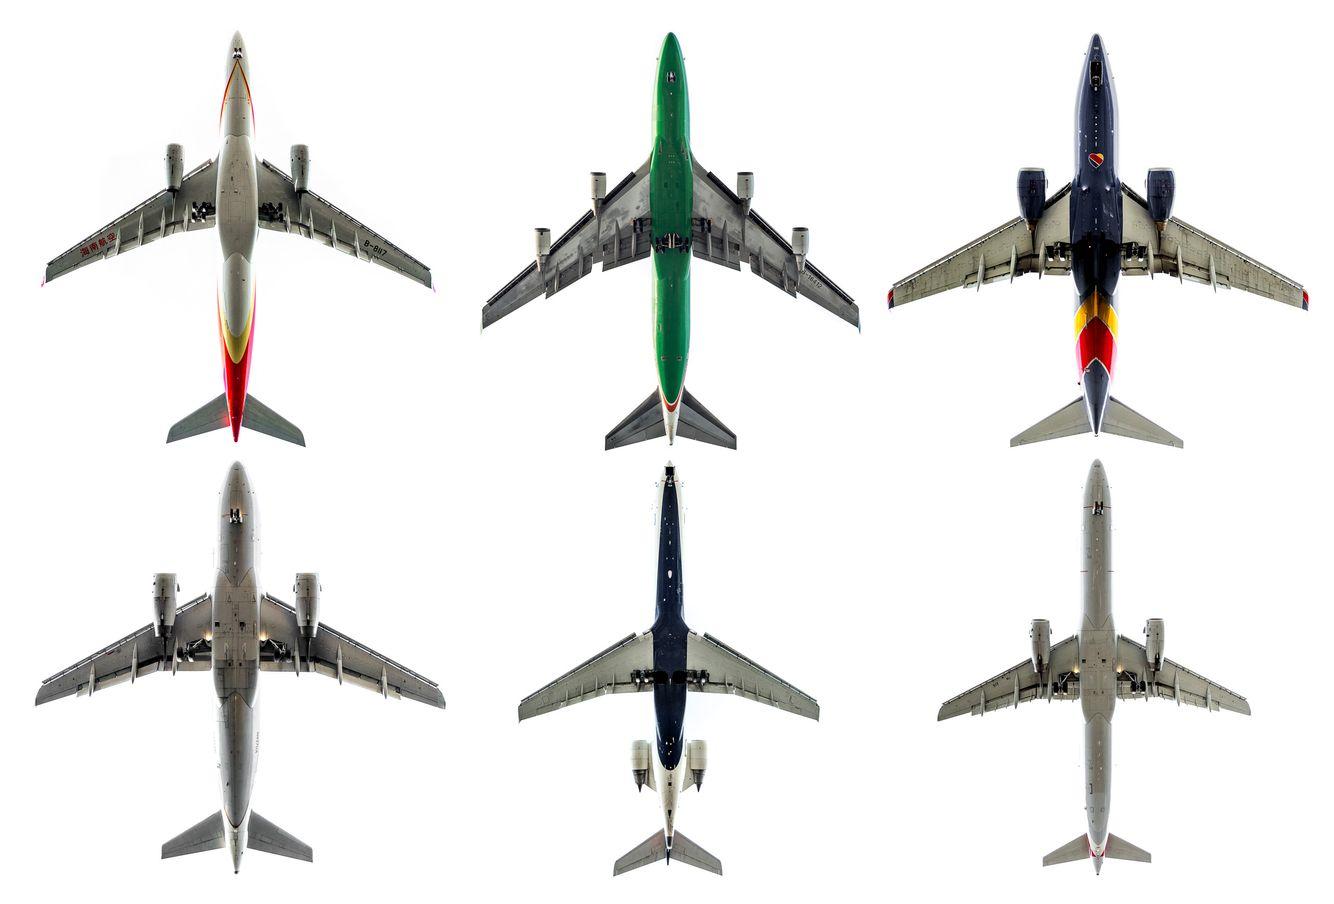 plane_06-Edit-Edit-2.jpg